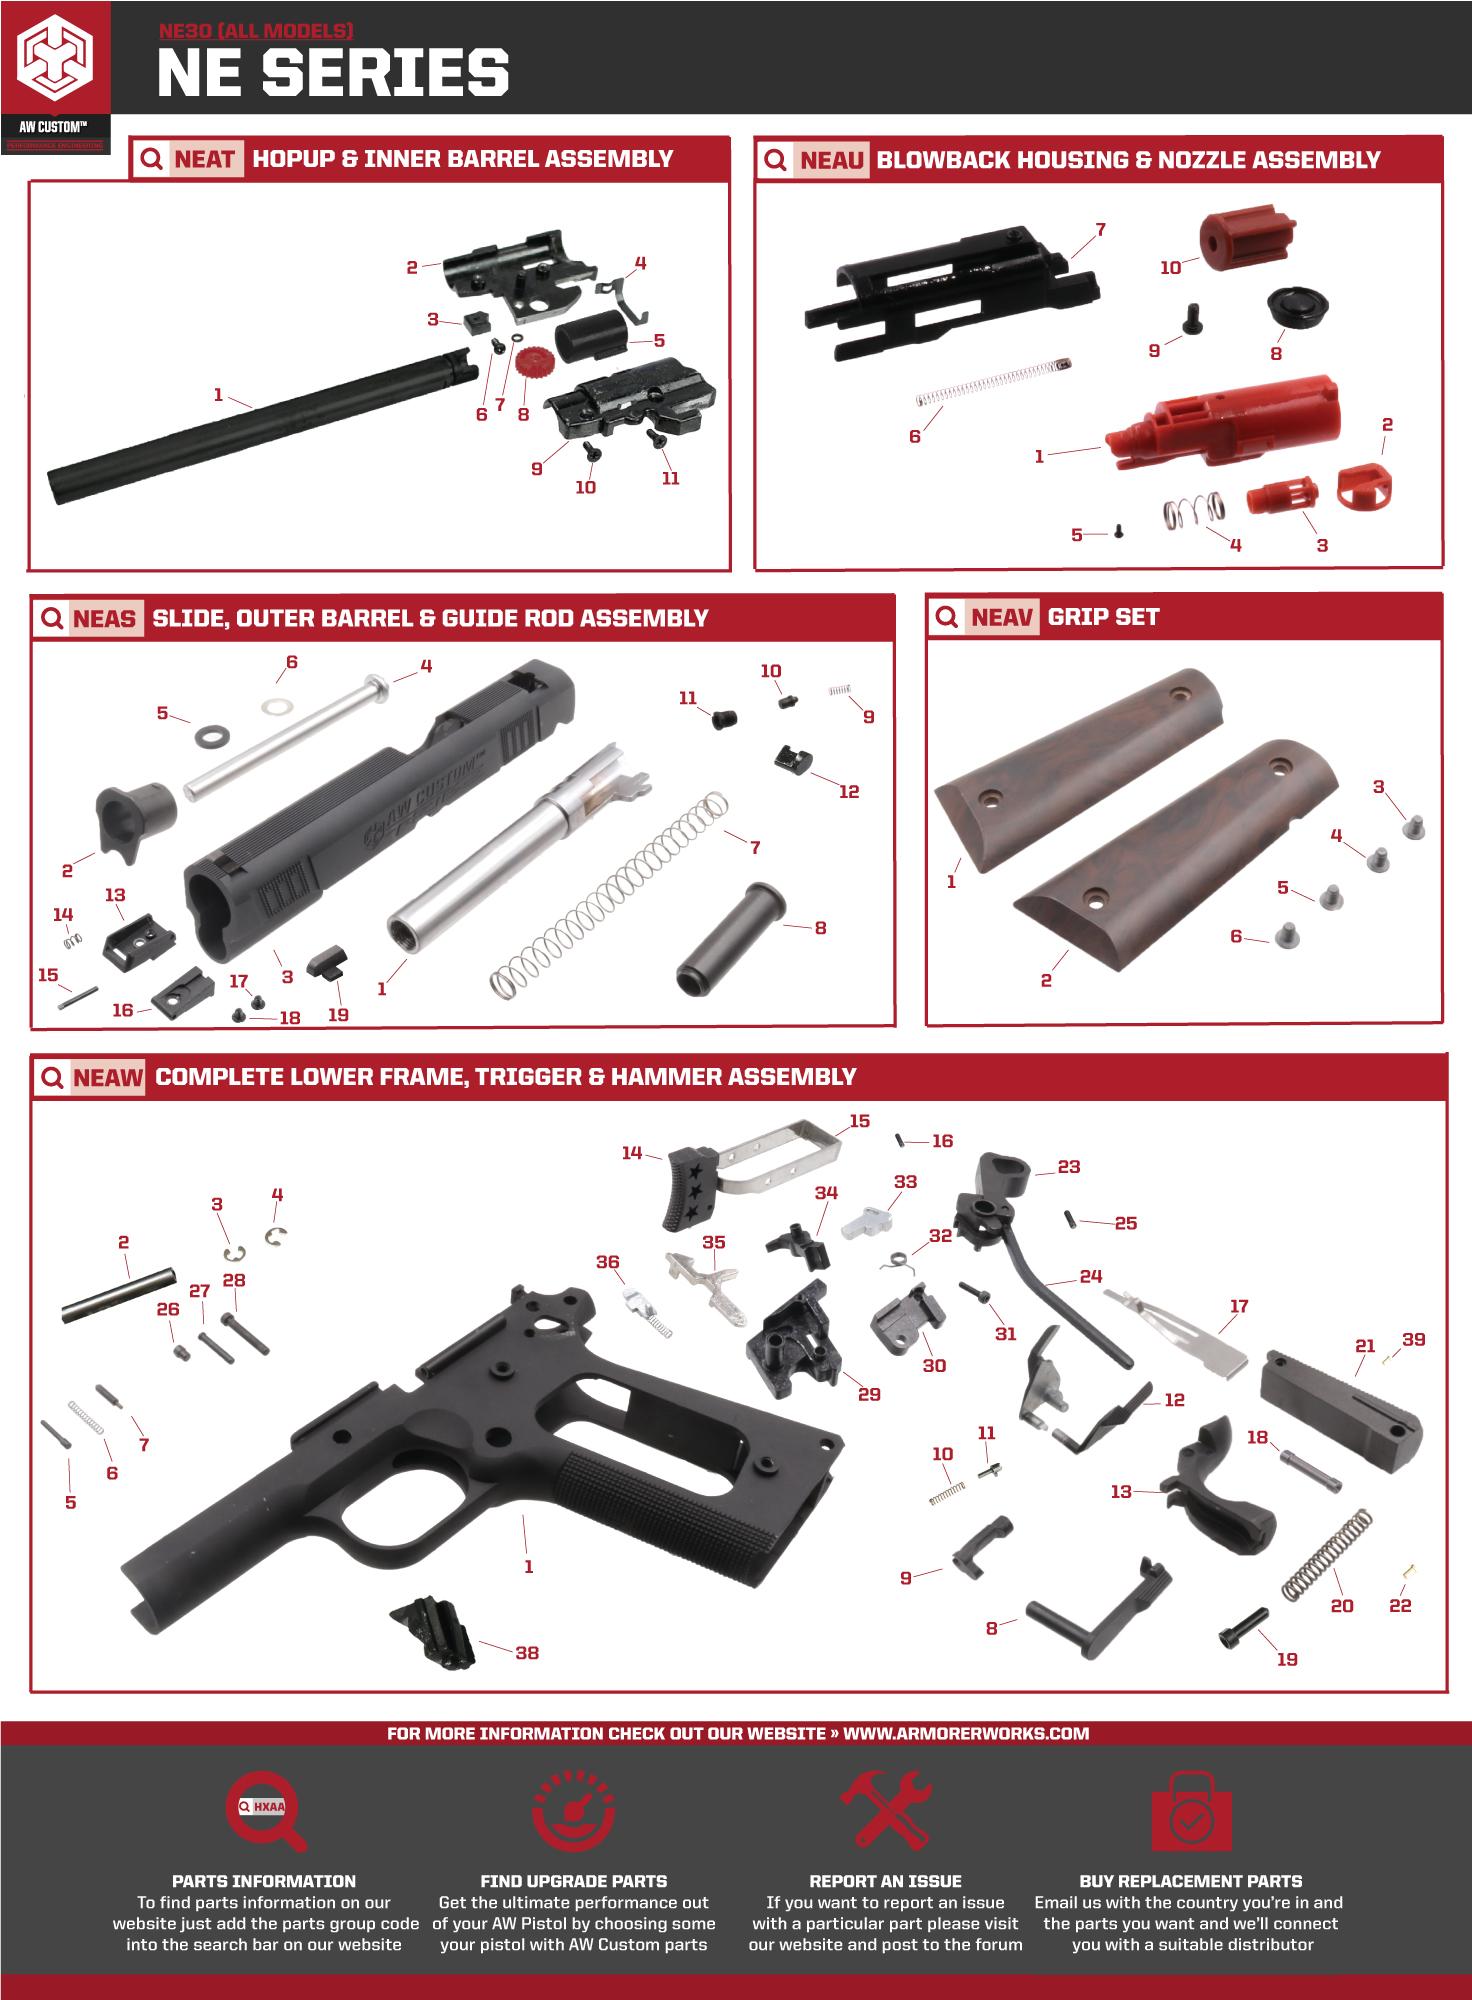 NE30 Parts Diagram on